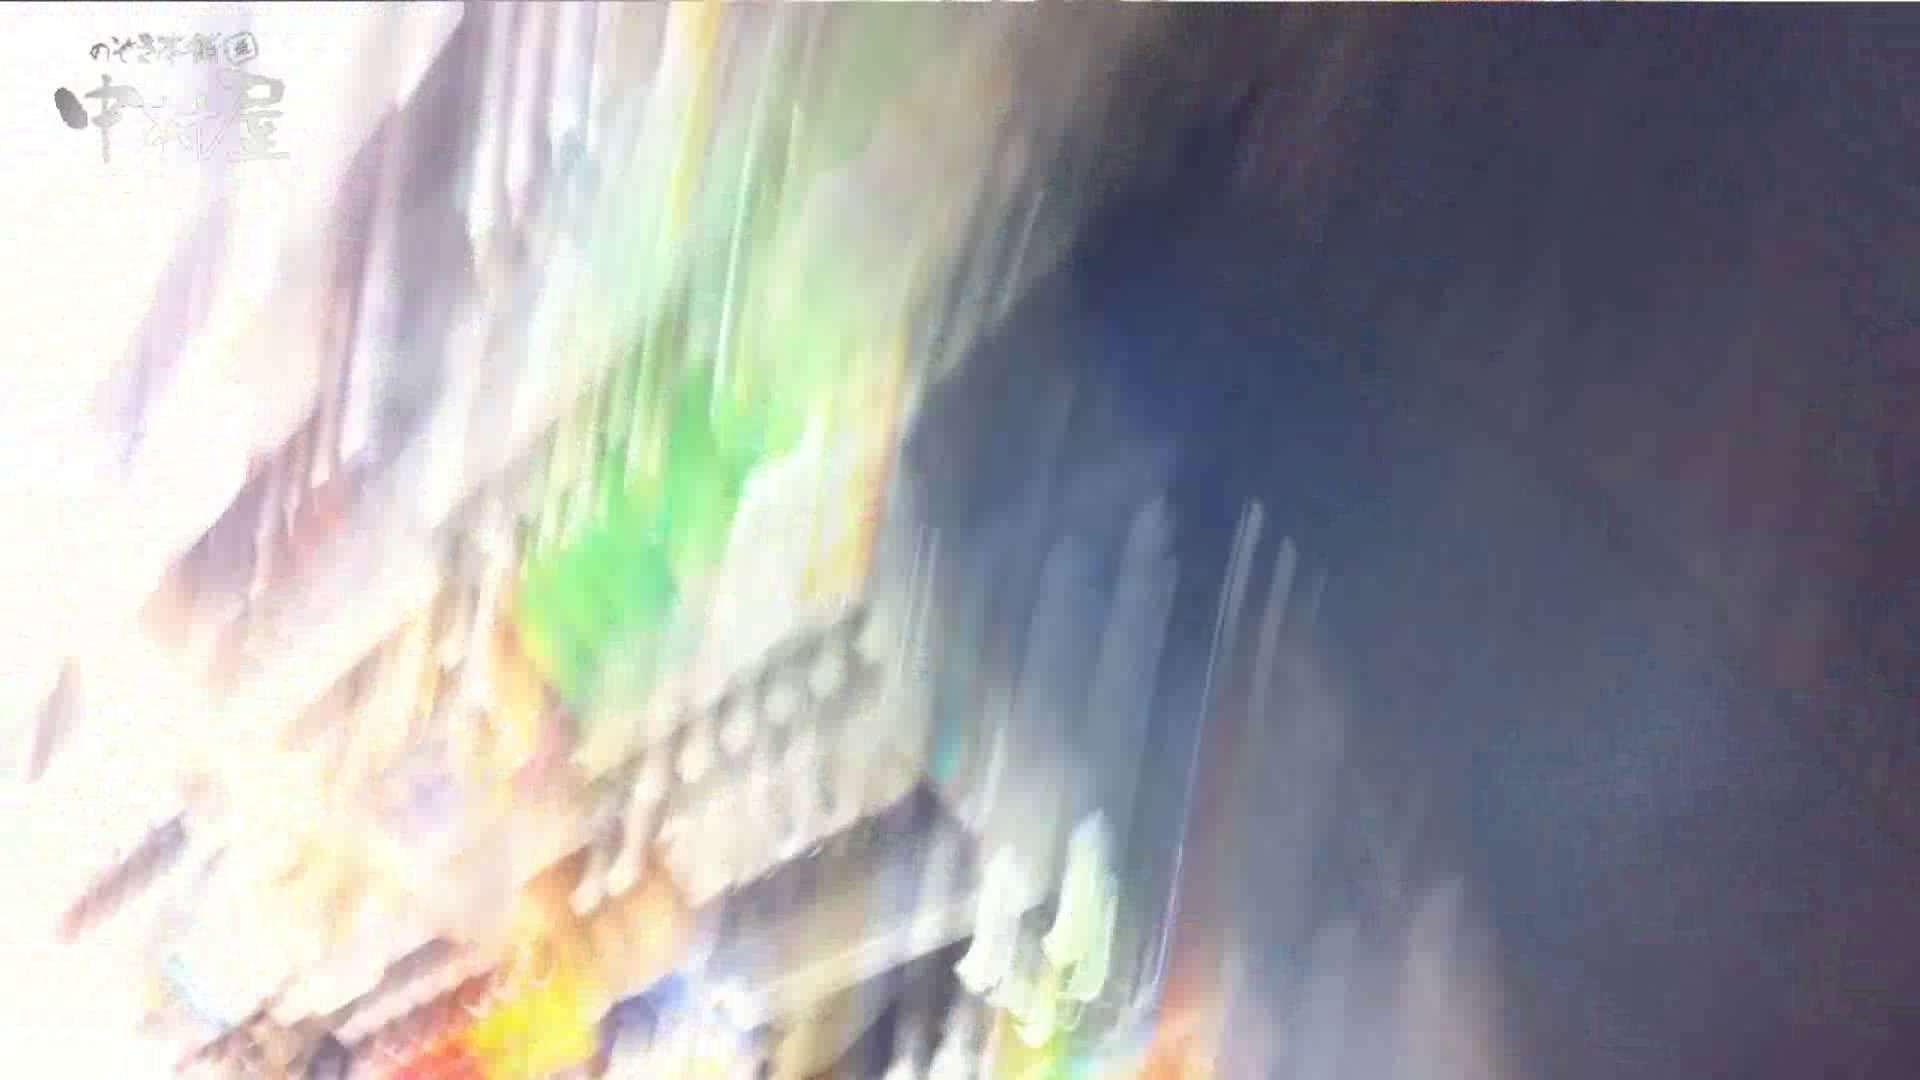 vol.70 美人アパレル胸チラ&パンチラ ベレー店員さんの下着 下着エロ画像  90PICs 48